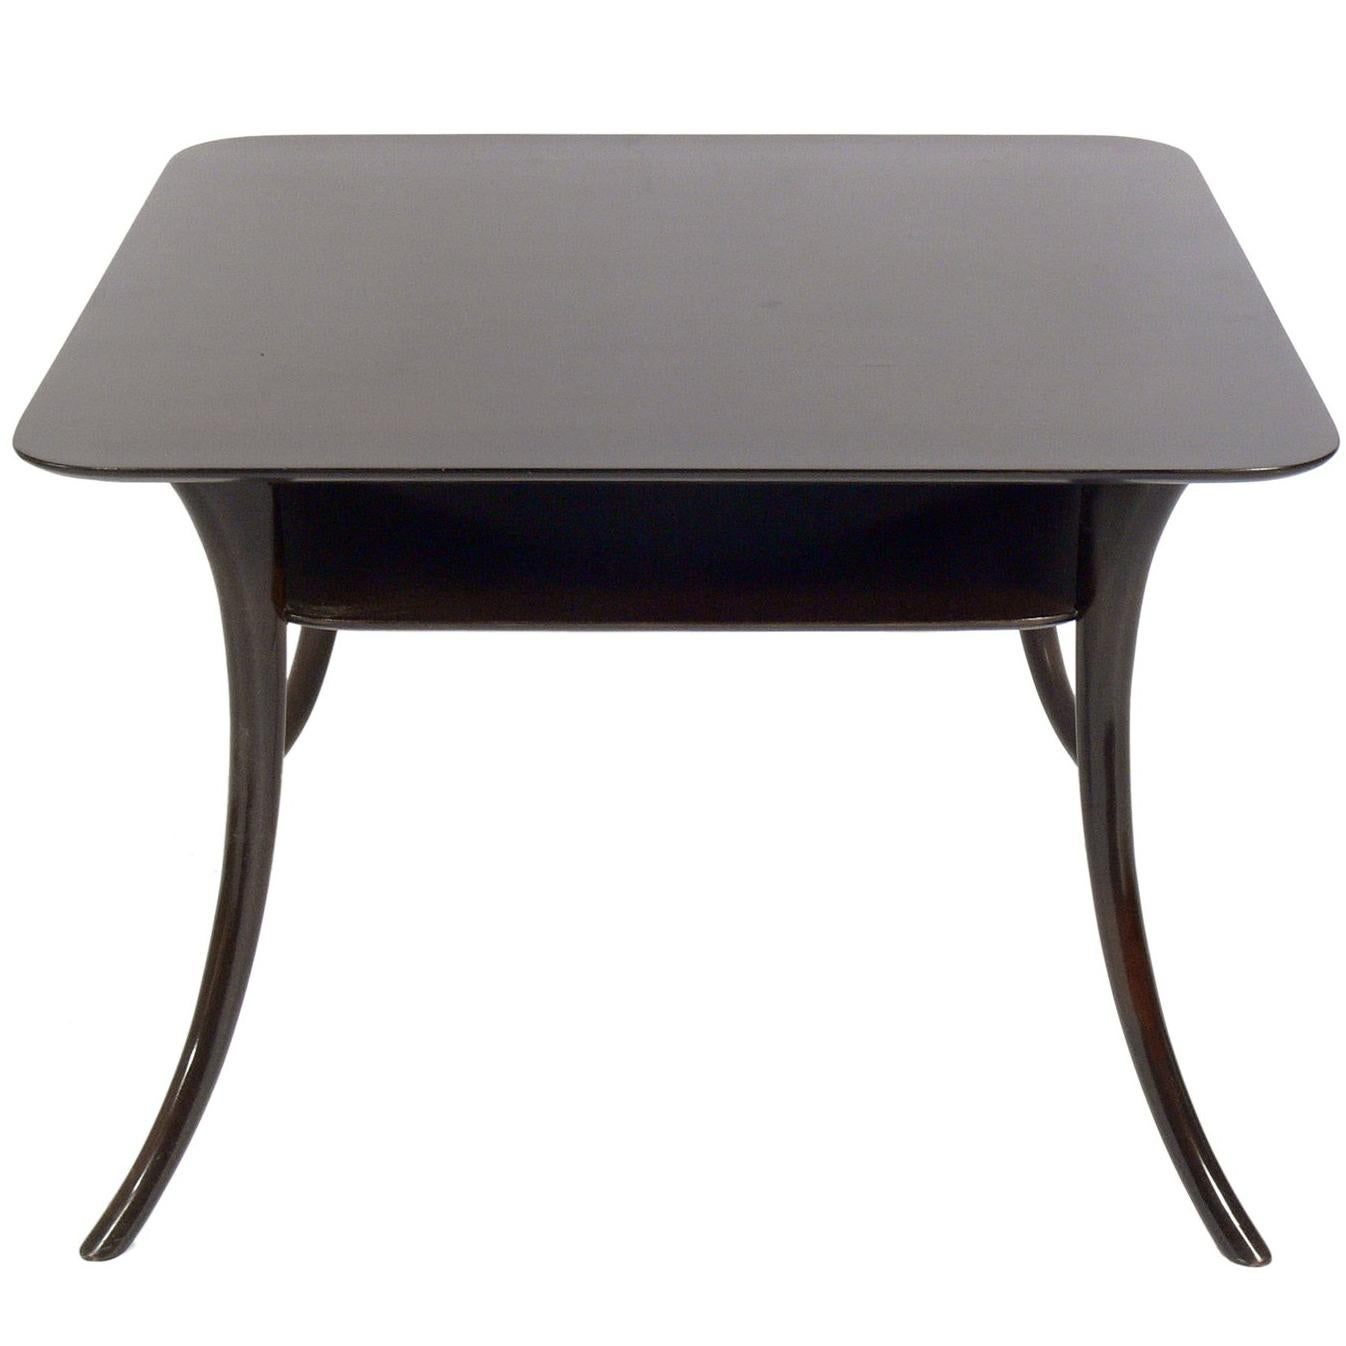 Splayed Leg End Table by T.H. Robsjohn-Gibbings